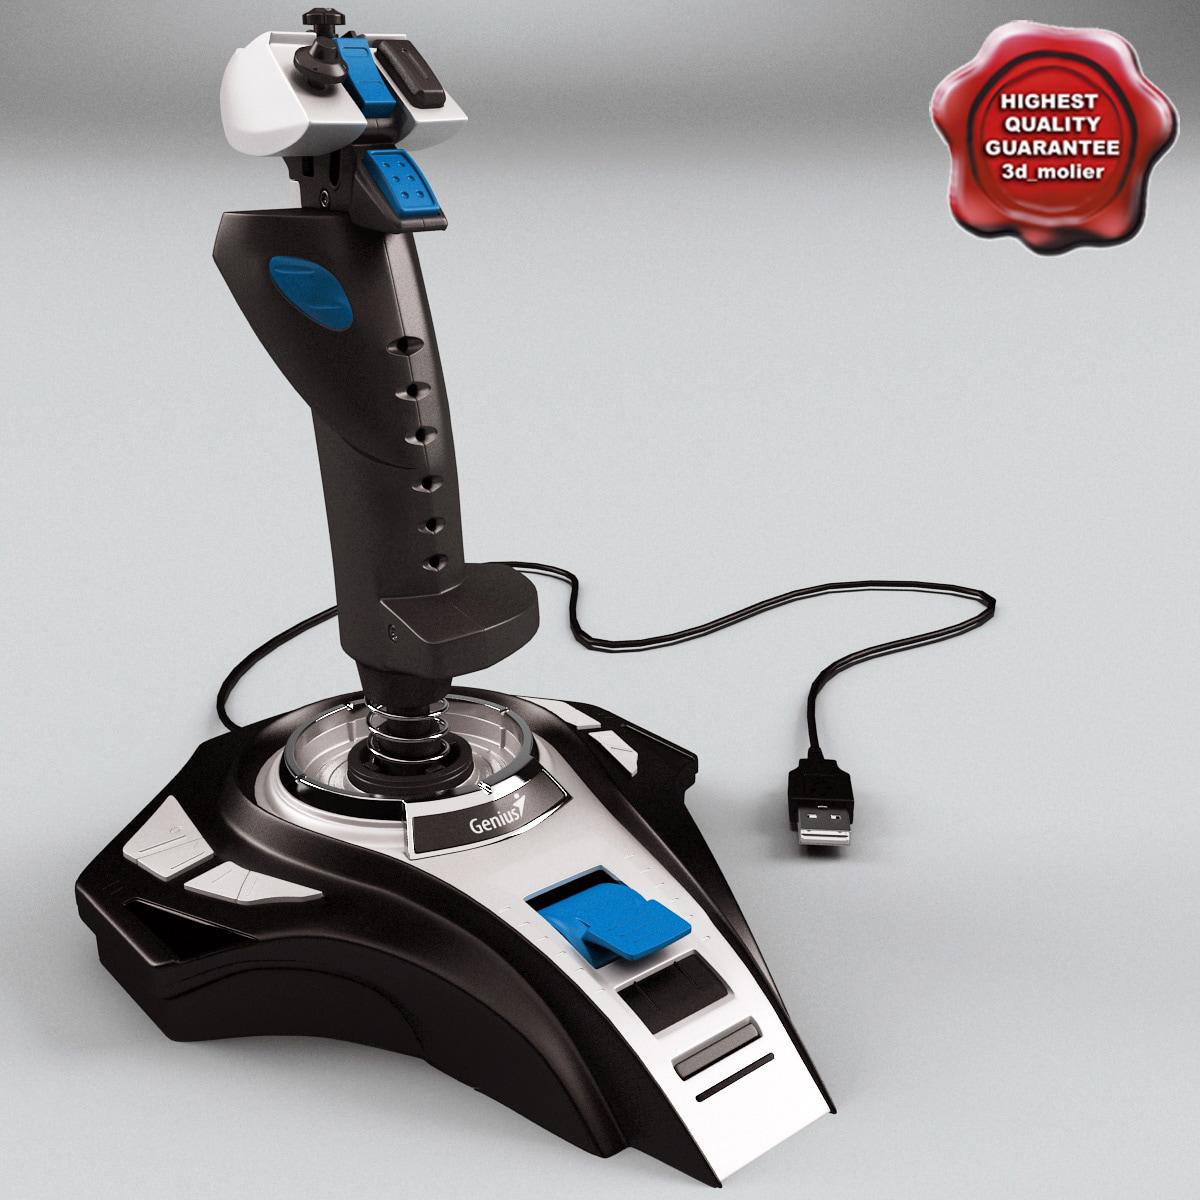 genius joystick metal strike max